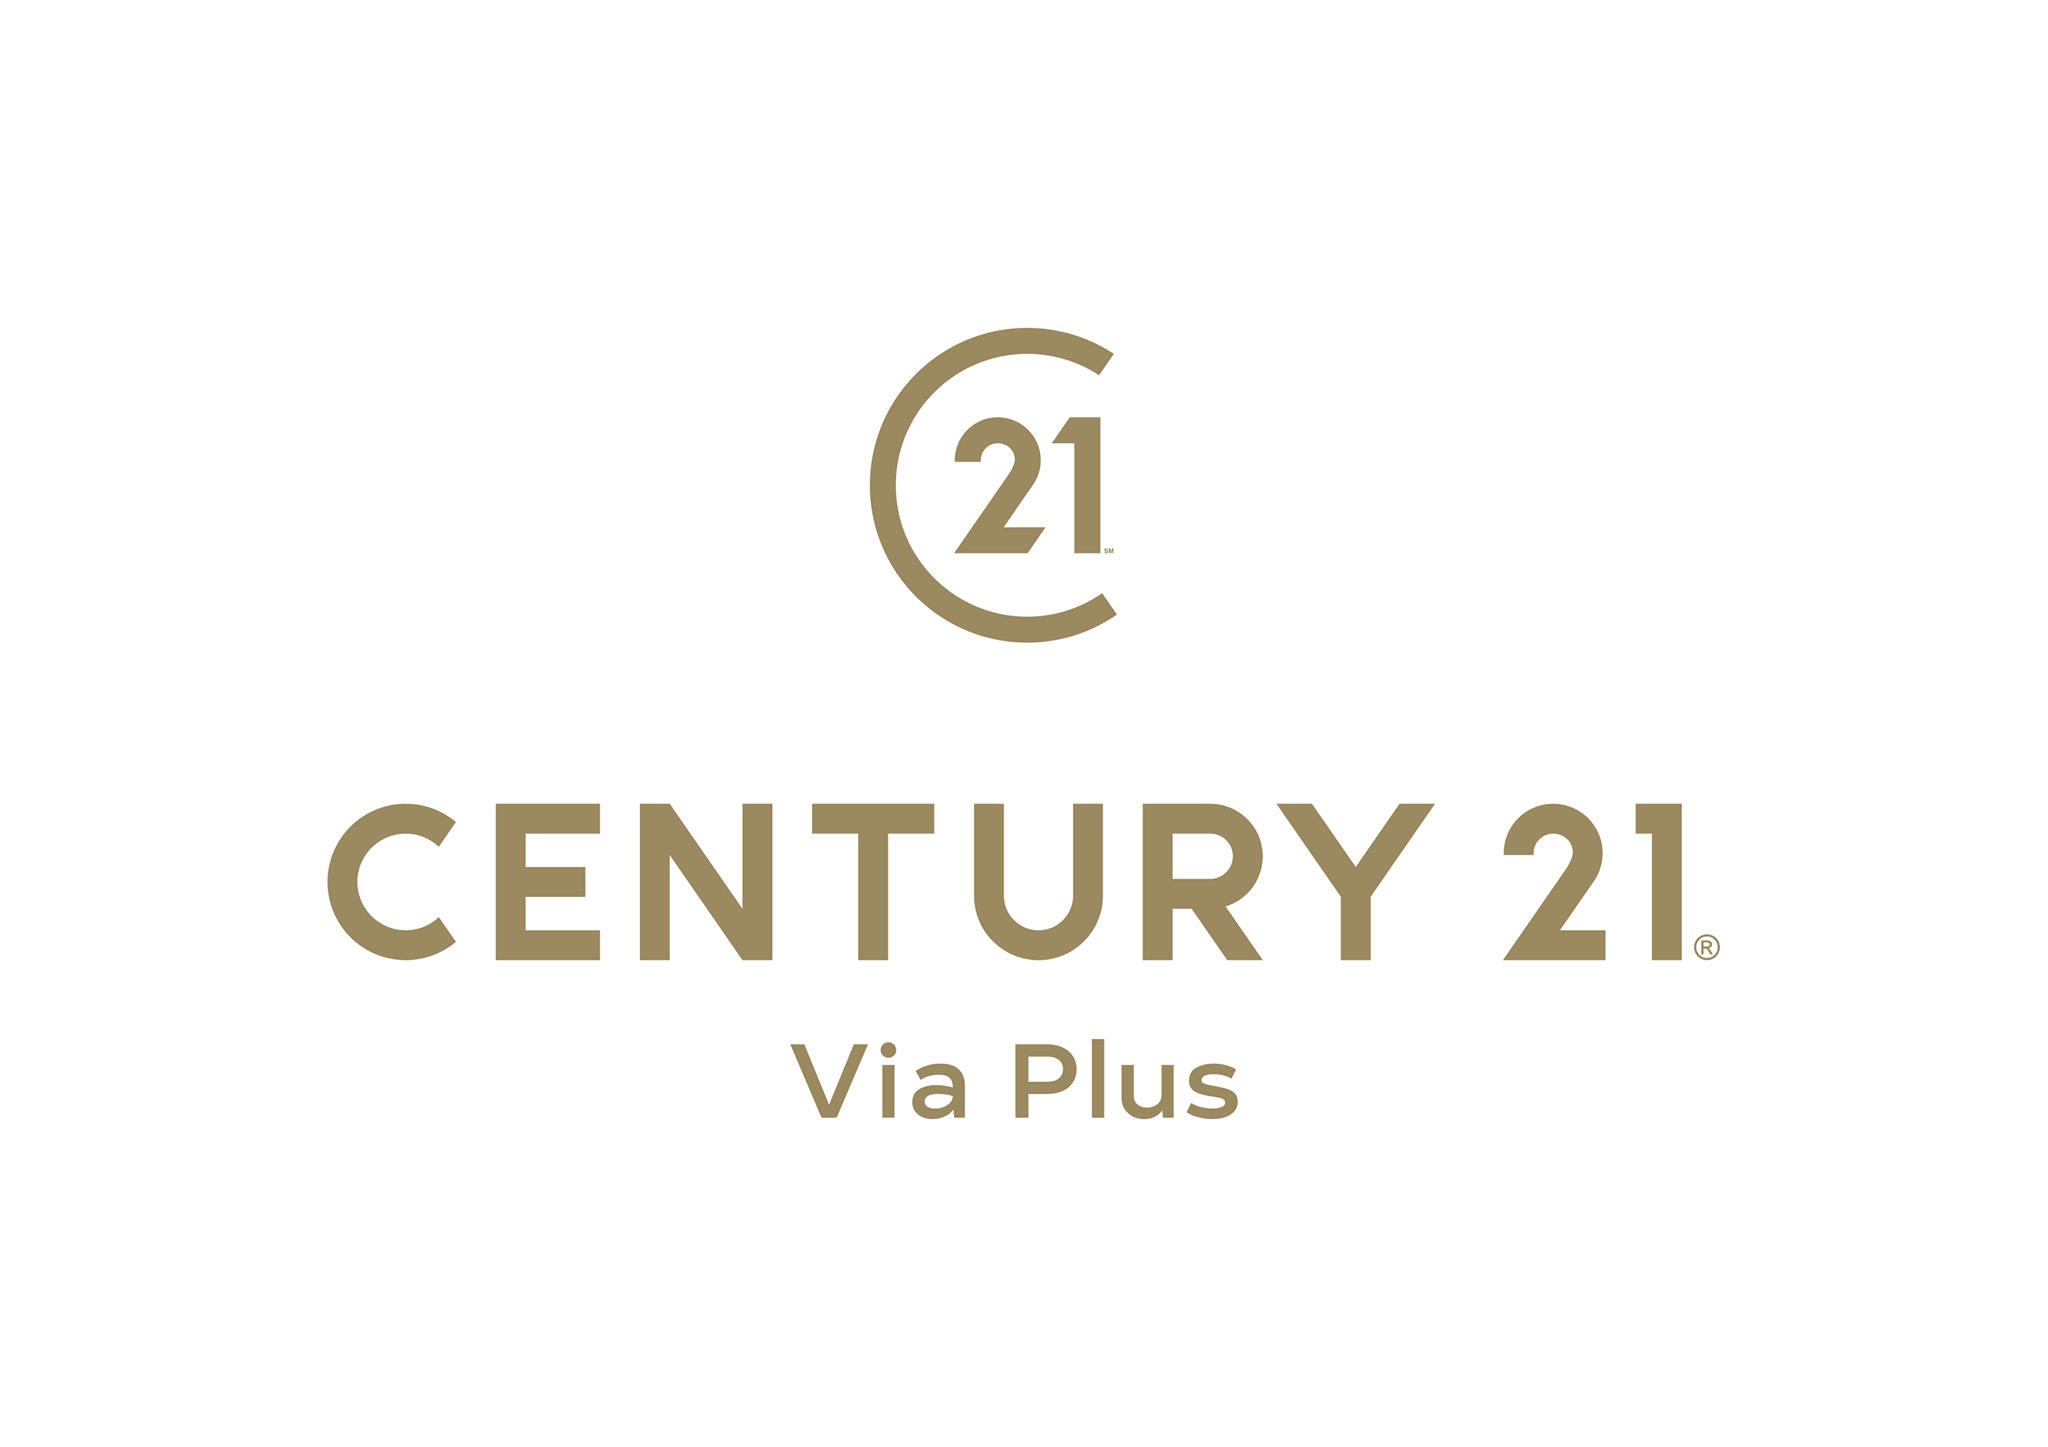 C21 via plus